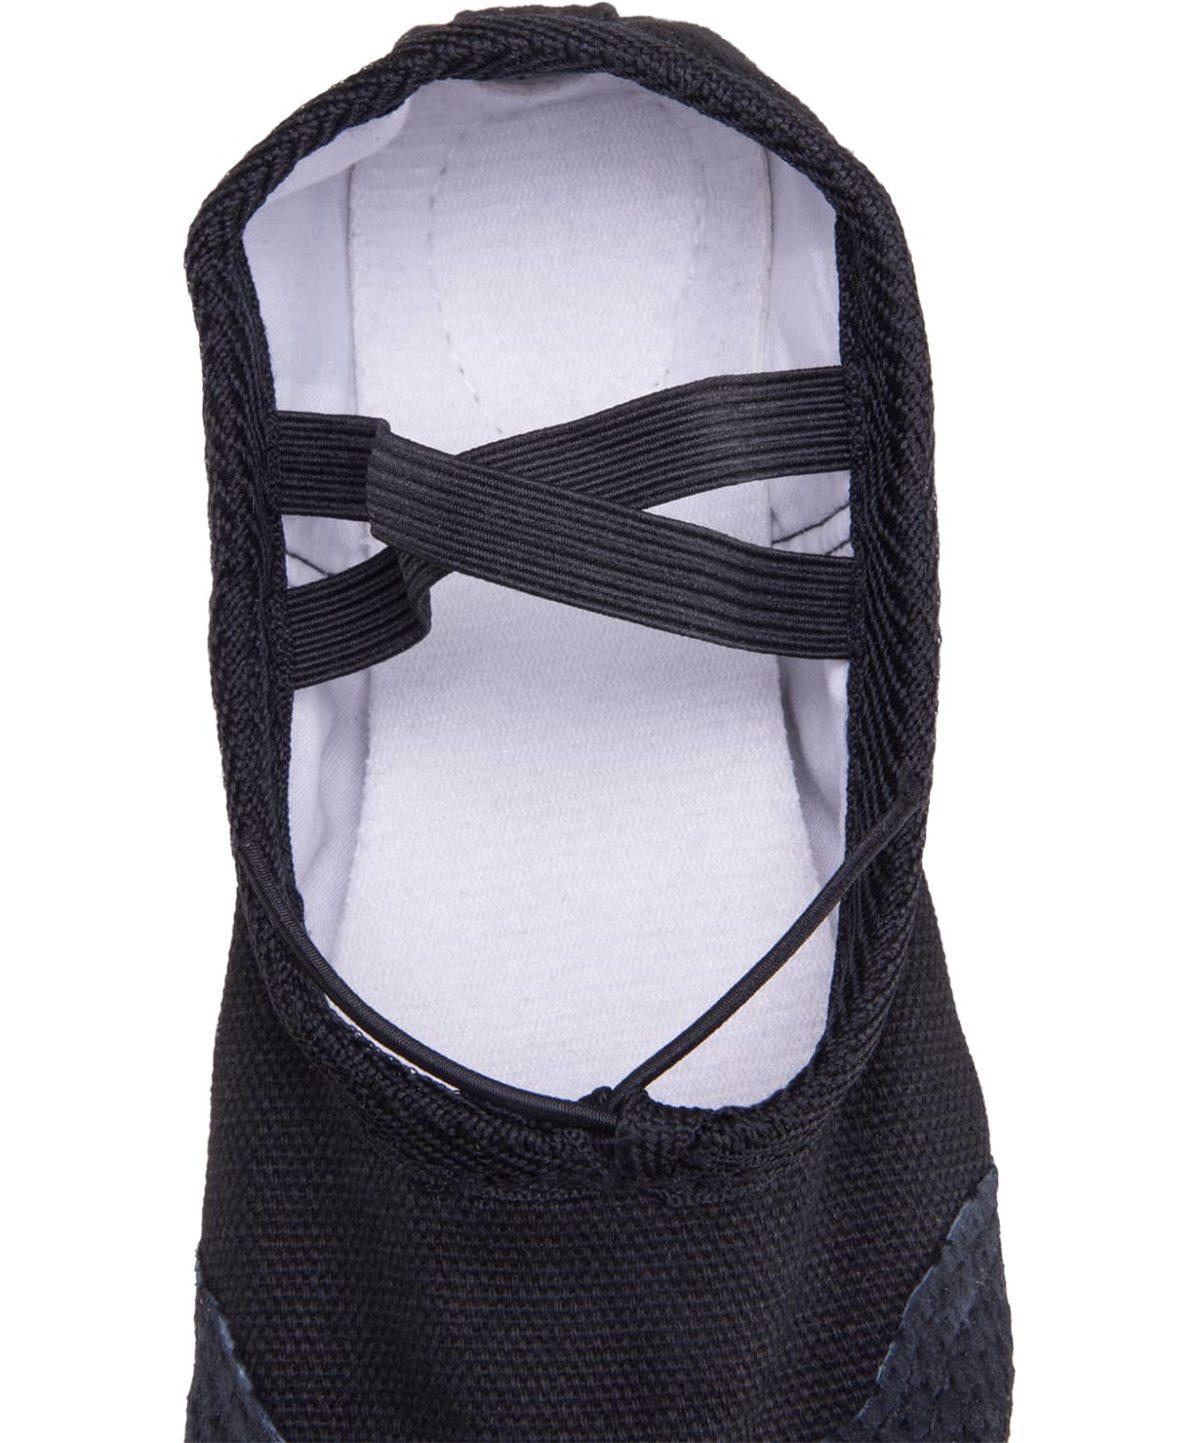 AMELY Балетки текстиль (32-37)  1689: чёрный - 2